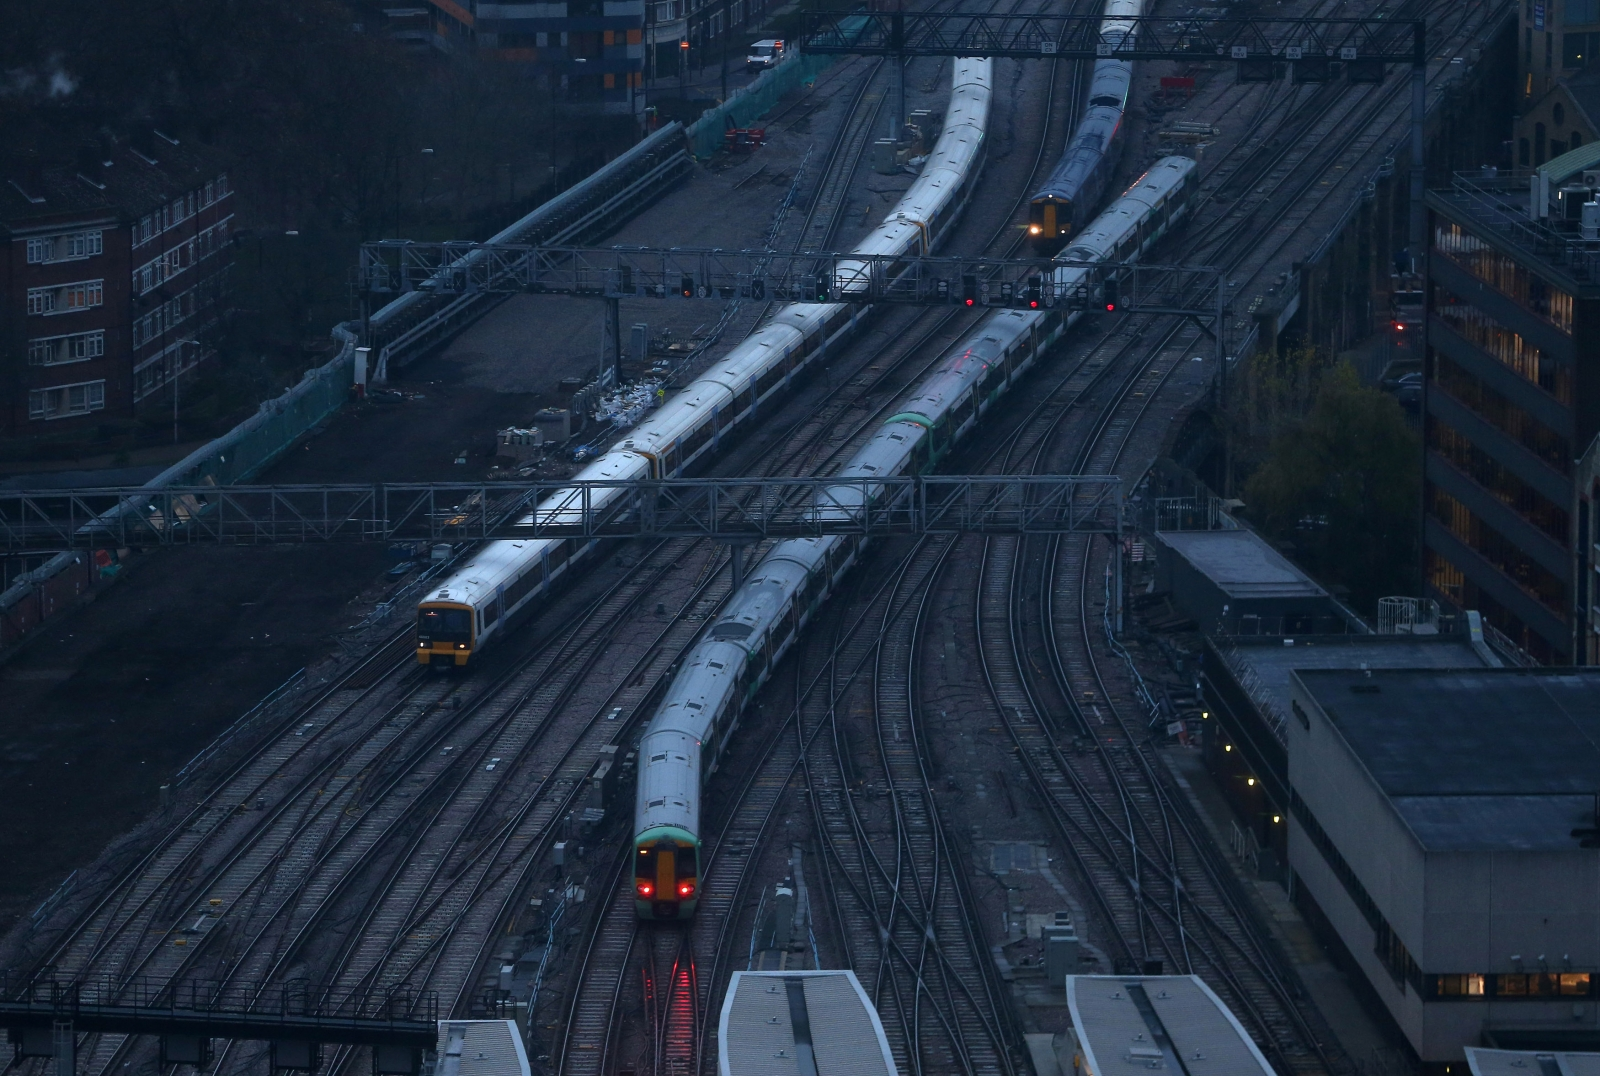 Trains in London Bridge